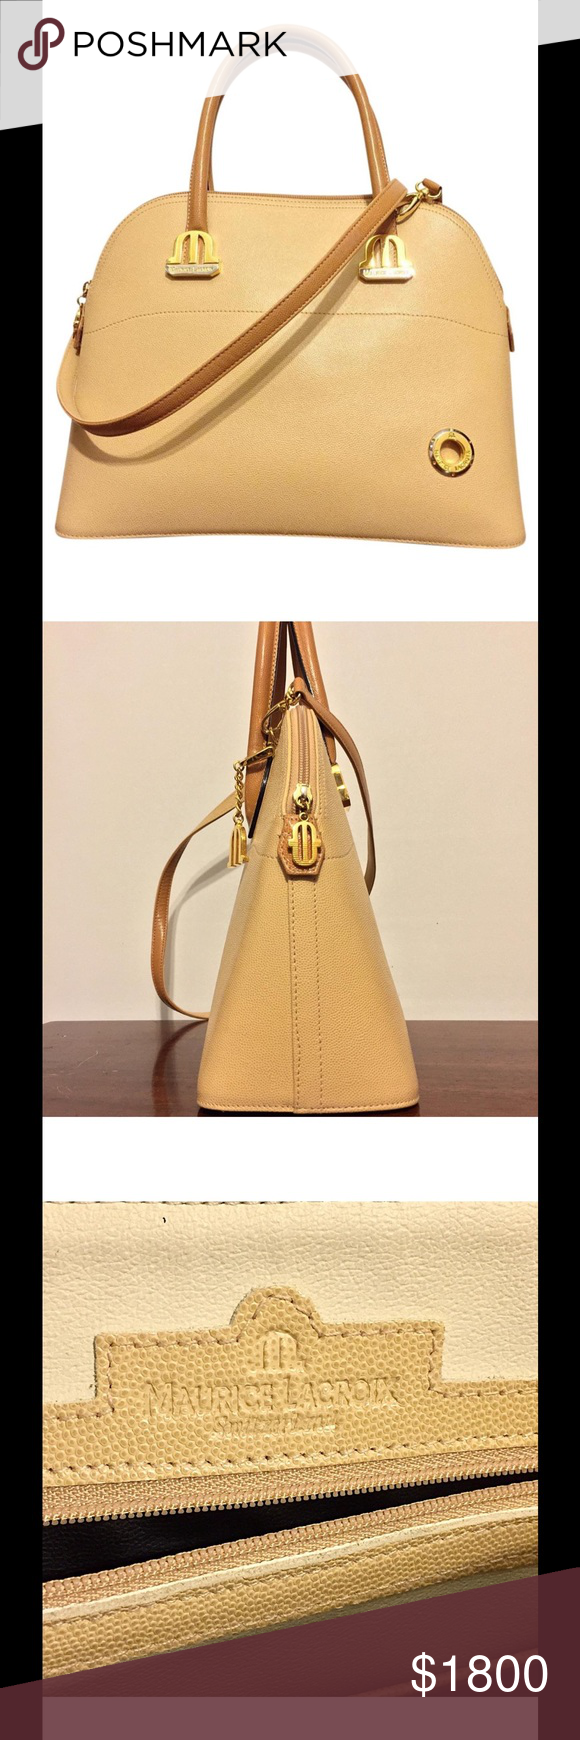 Maurice Lacroix Rare Leather Alma Handbag Charm Super Switzerland By